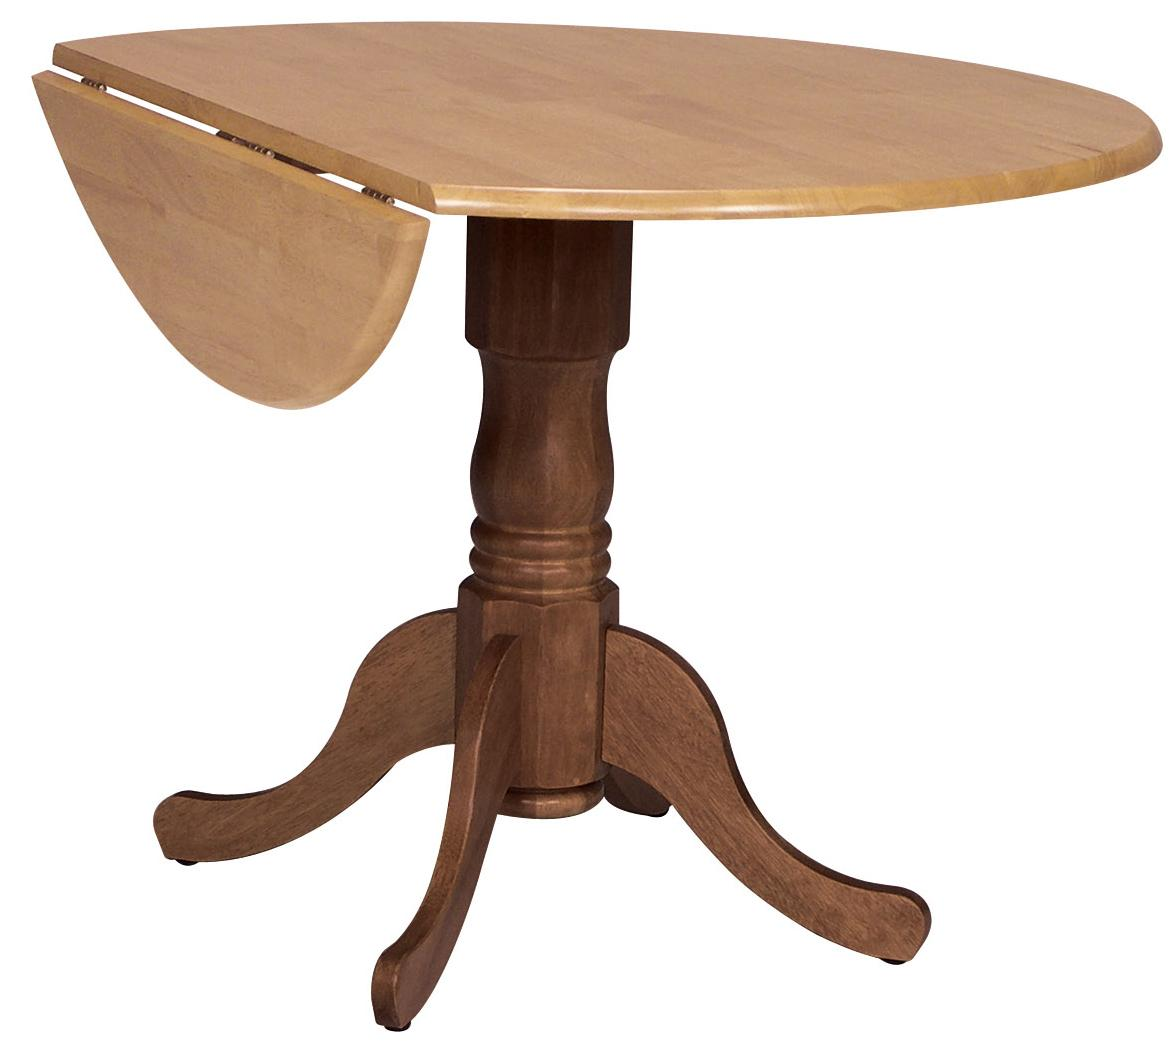 john thomas dining essentials 42 round drop leaf pedestal table wayside furniture kitchen table. Black Bedroom Furniture Sets. Home Design Ideas